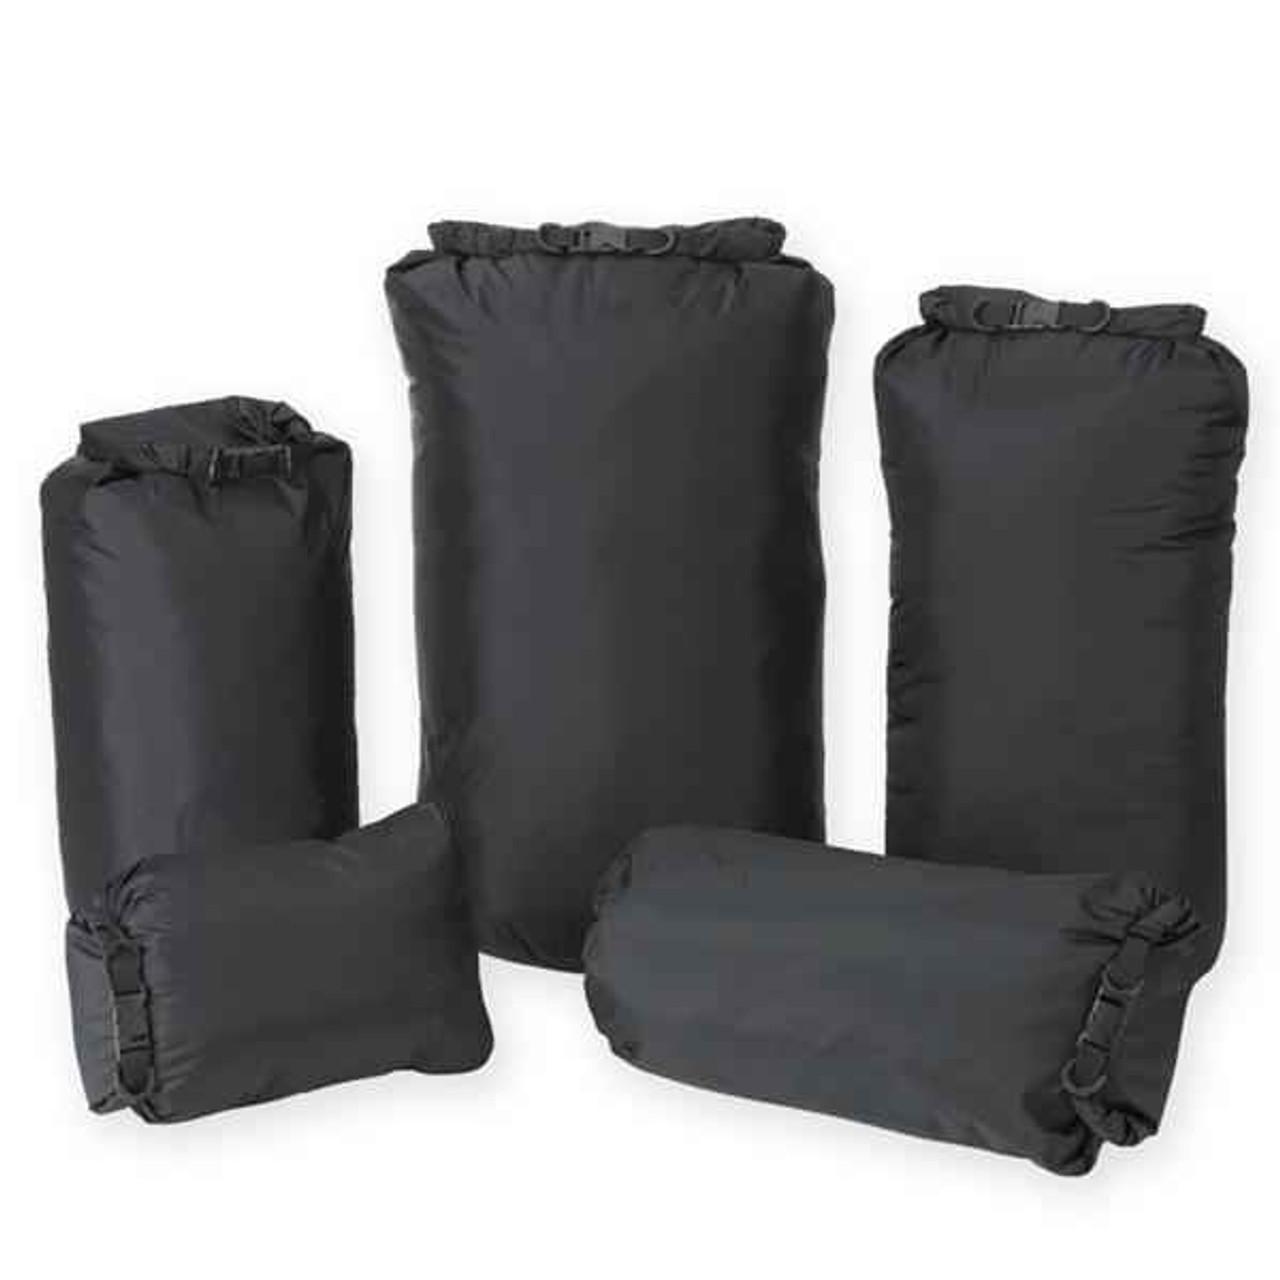 Pro Force Dri-Sak Waterproof Bag - Small, Black